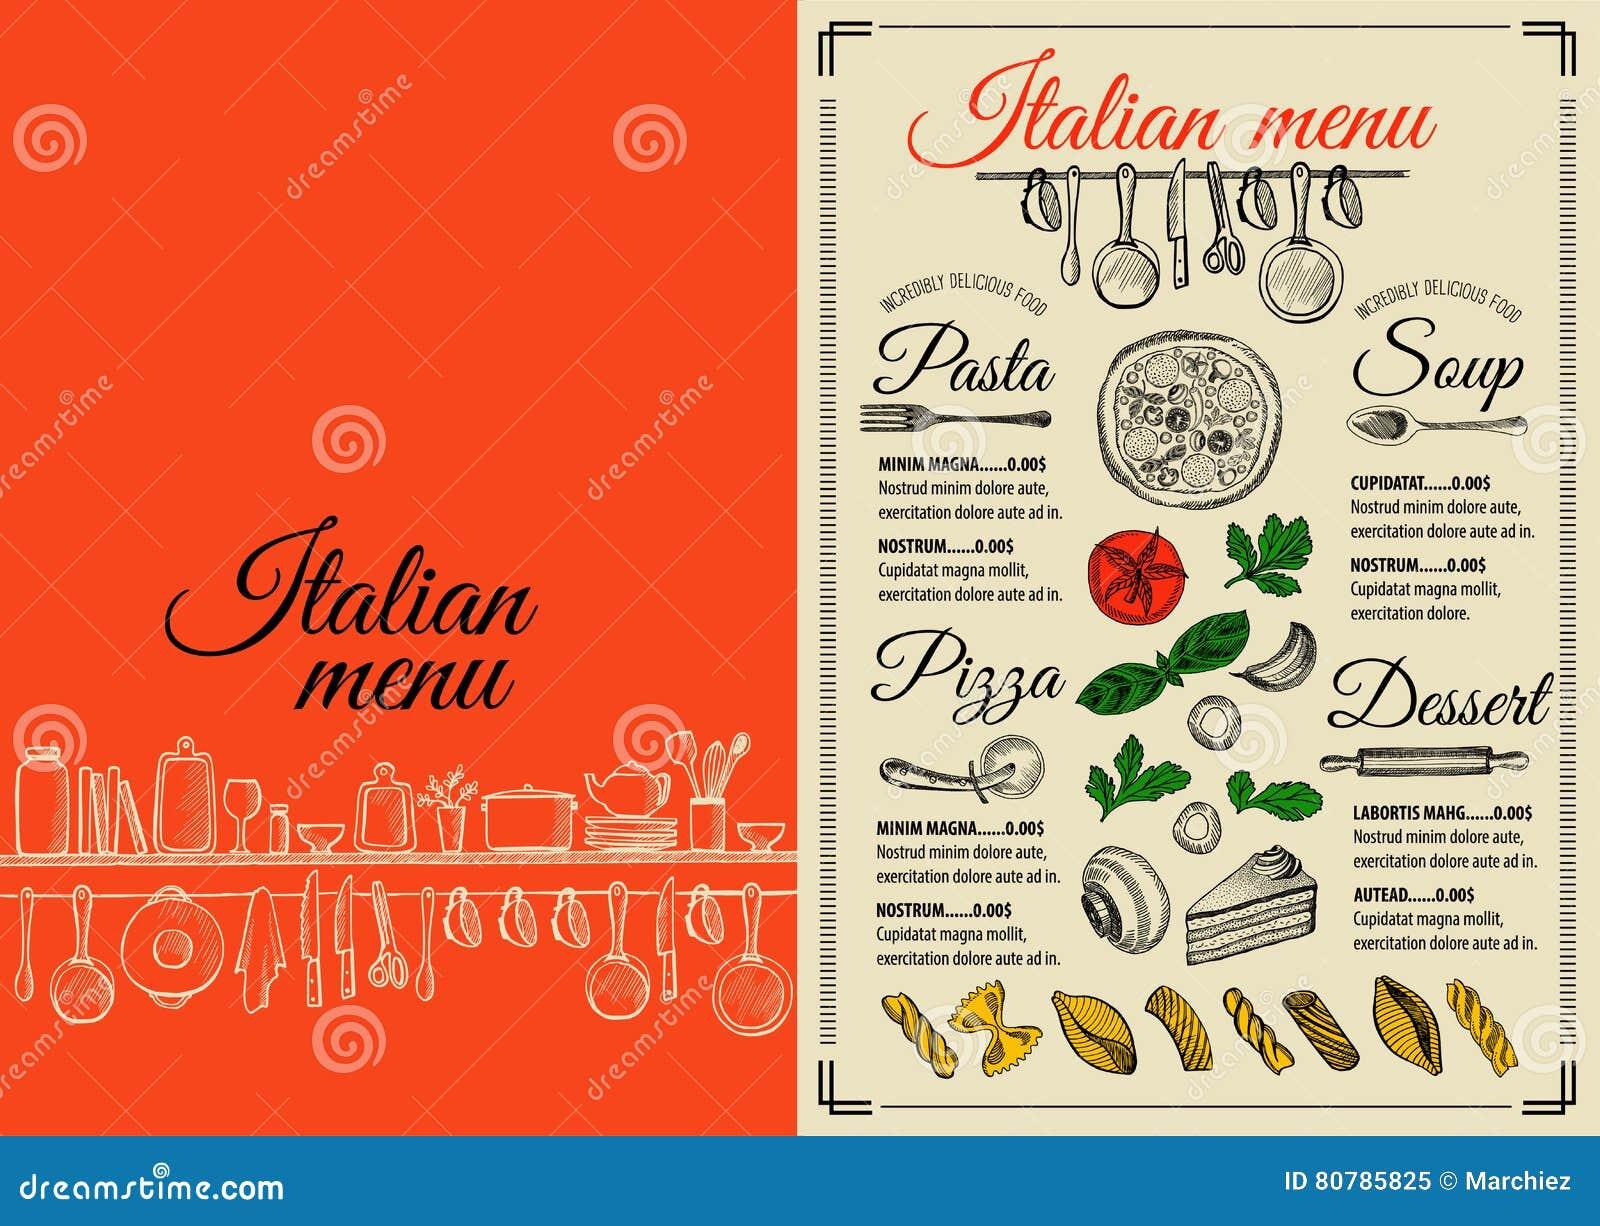 Menu Italian Restaurant Food Template Placemat Stock Vector Illustration Of Chalkboard Logo 80785825